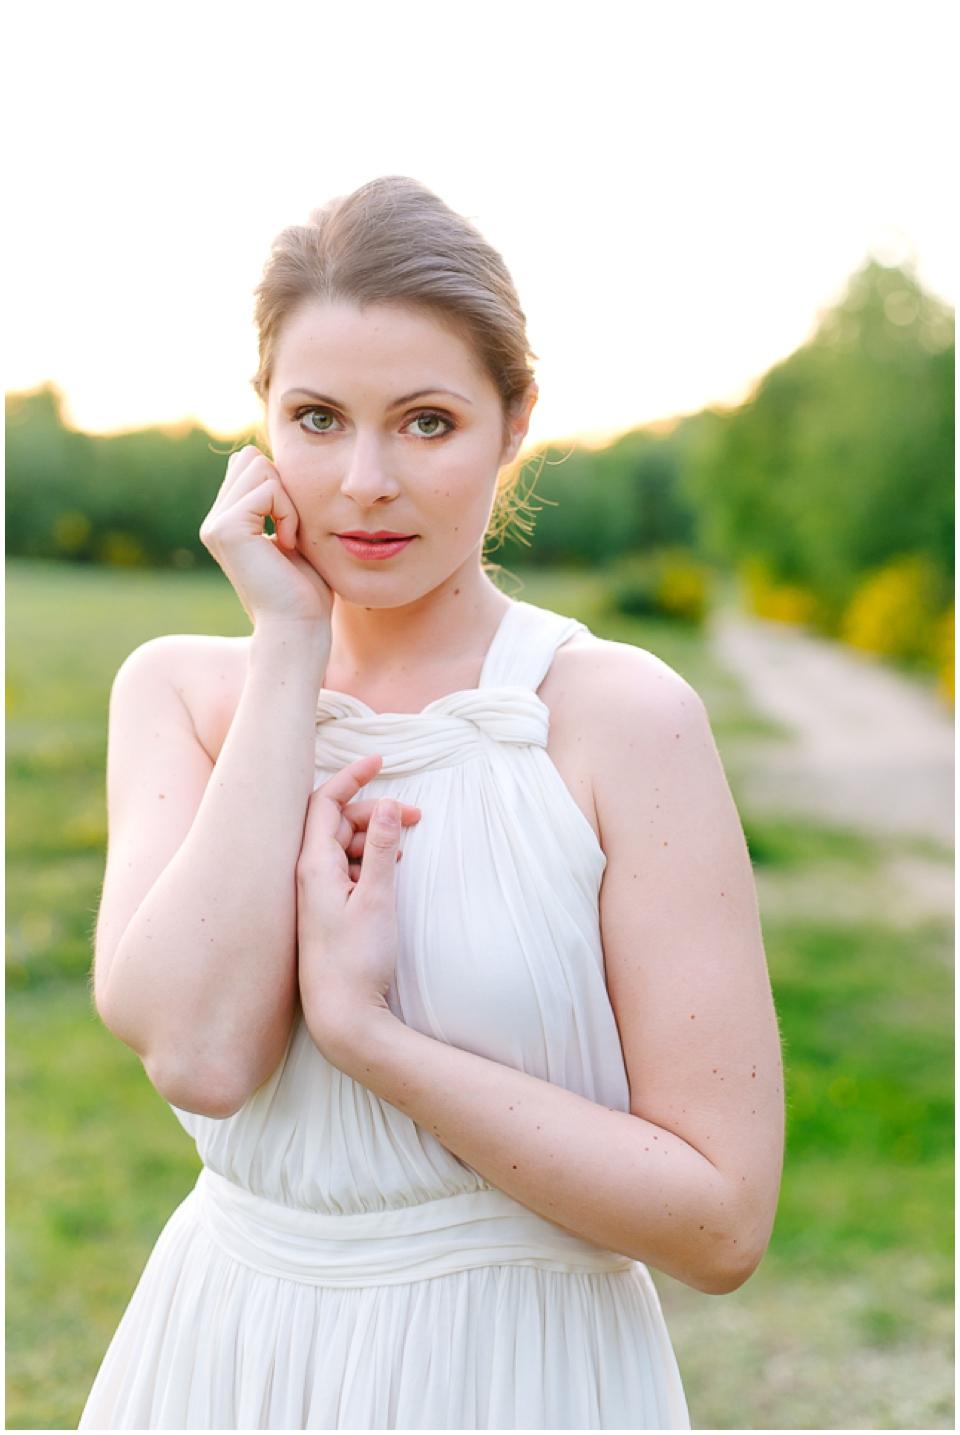 Nicole Wahl Fotografie - Imagefilm_0007